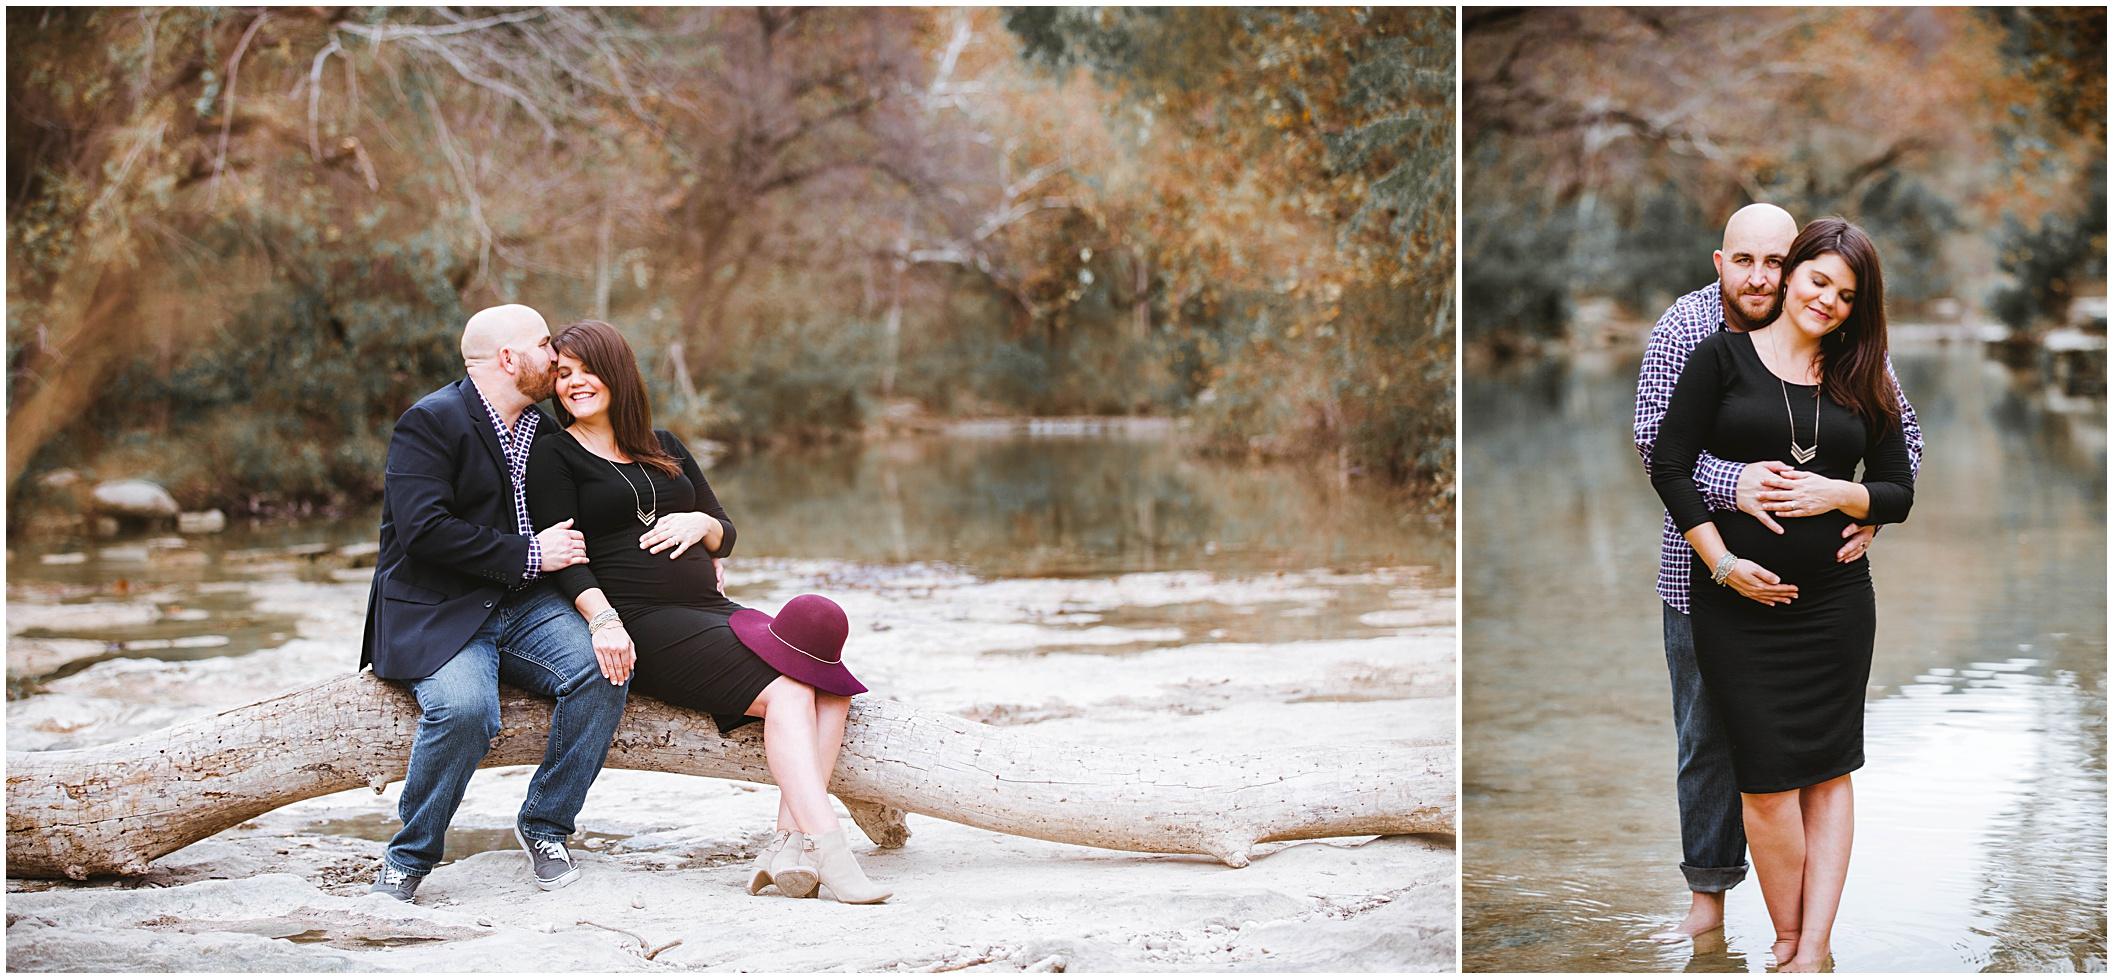 Austin Maternity Session Photography_0086.jpg